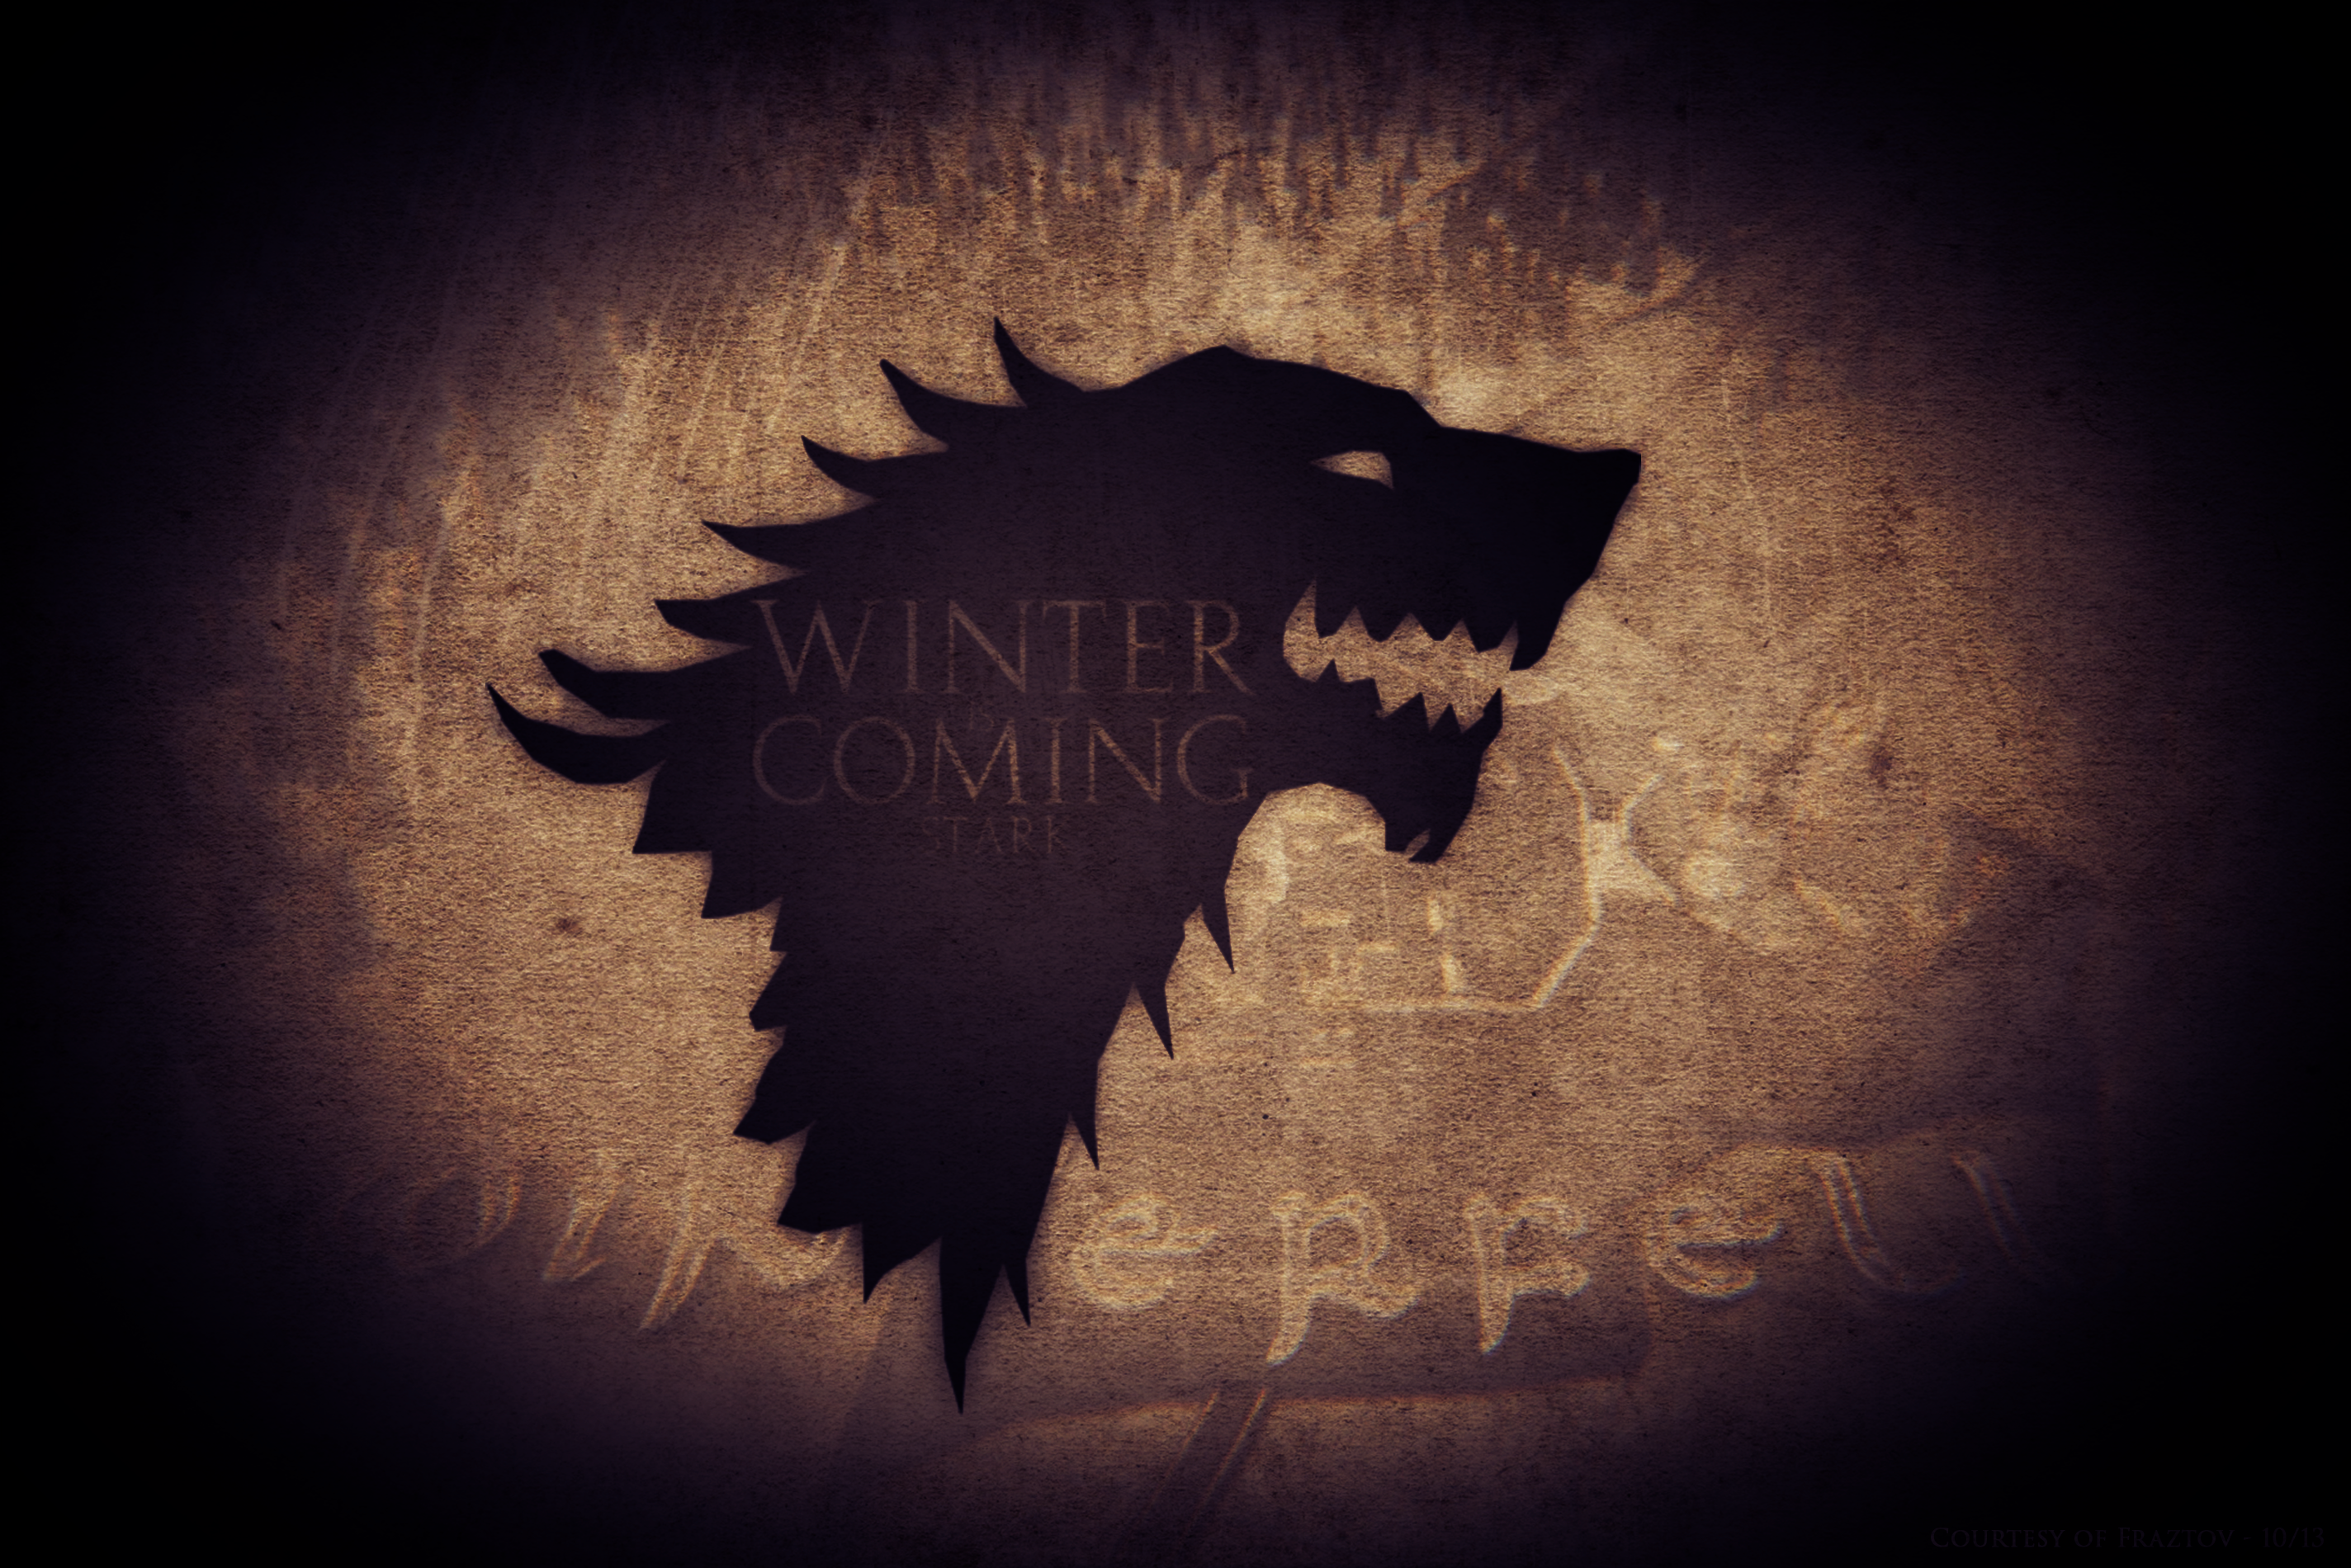 Game of Thrones   Stark Wallpaper by Fraztov 2848x1900